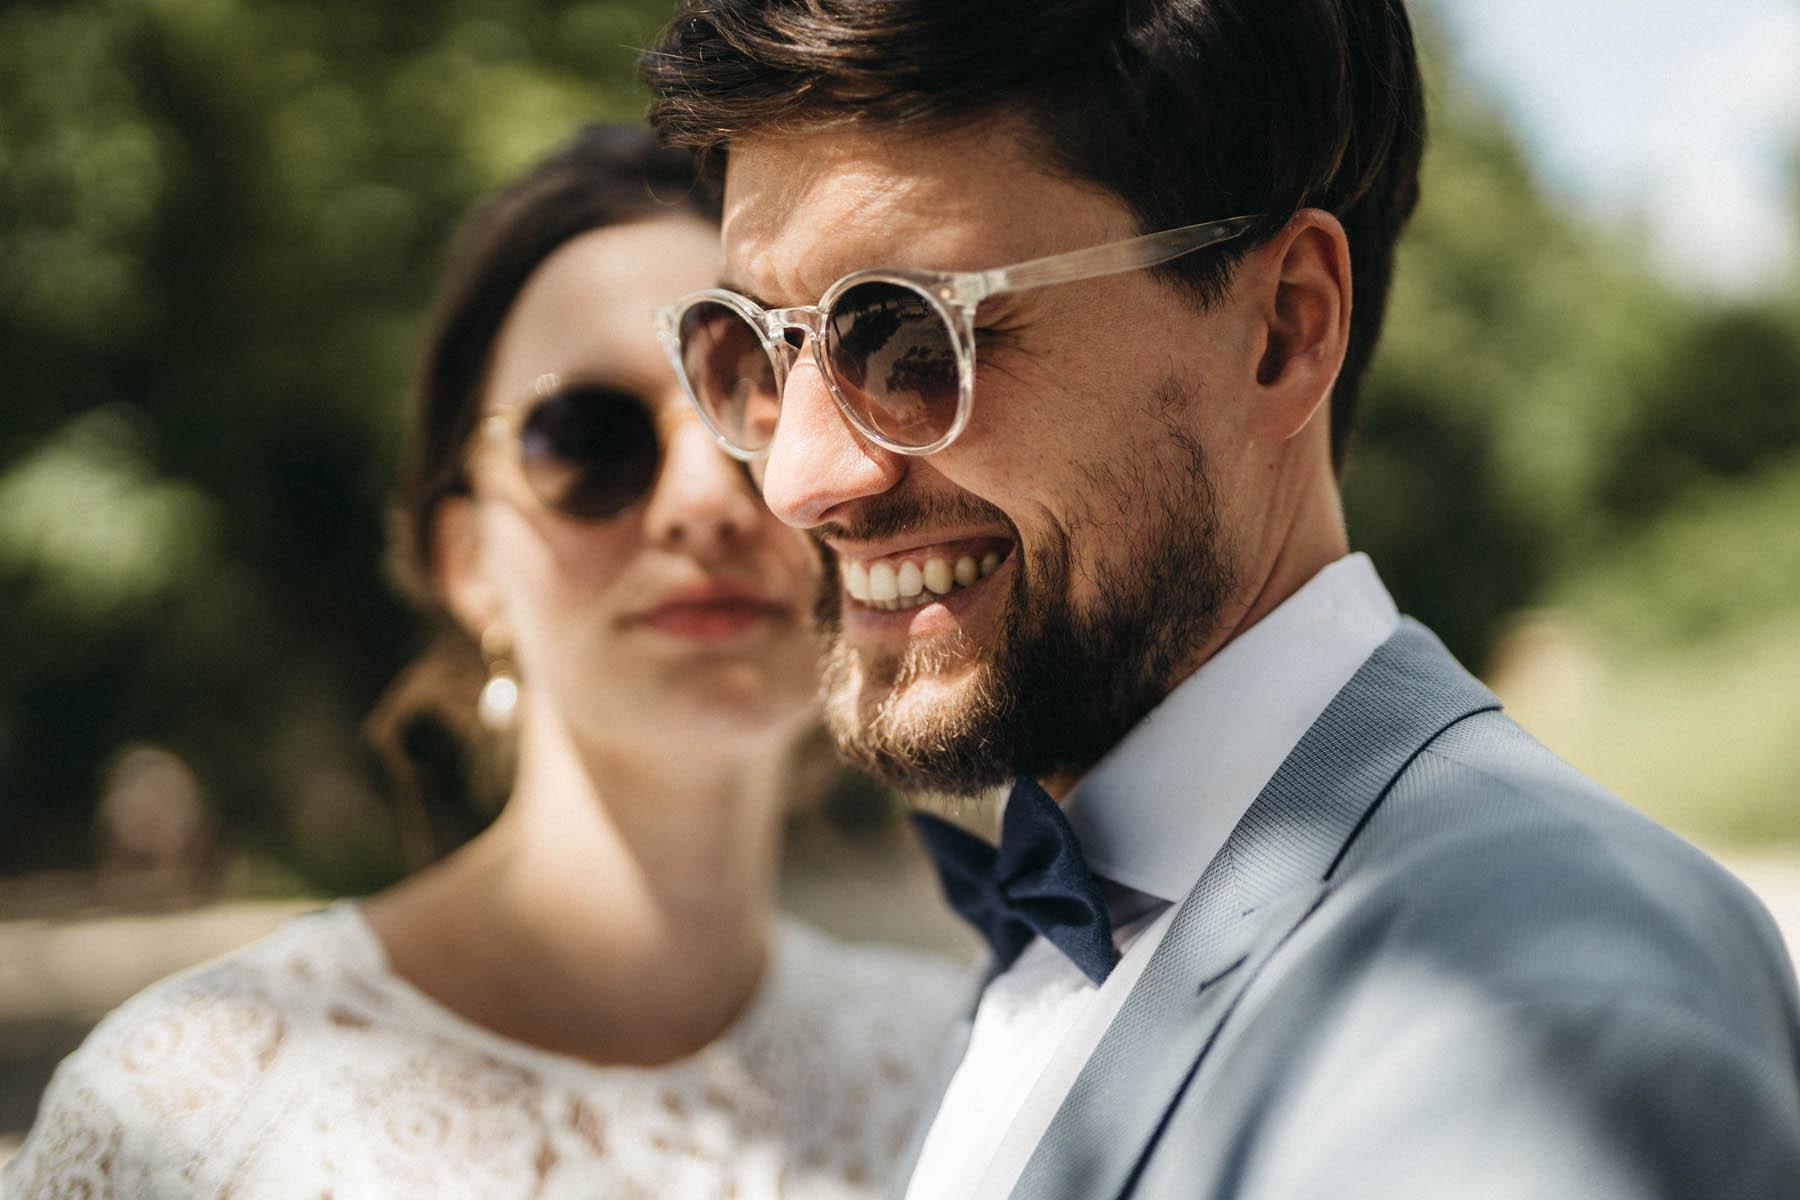 raissa simon fotografie elopement freiburg standesamt 067 - Julia + Tobias